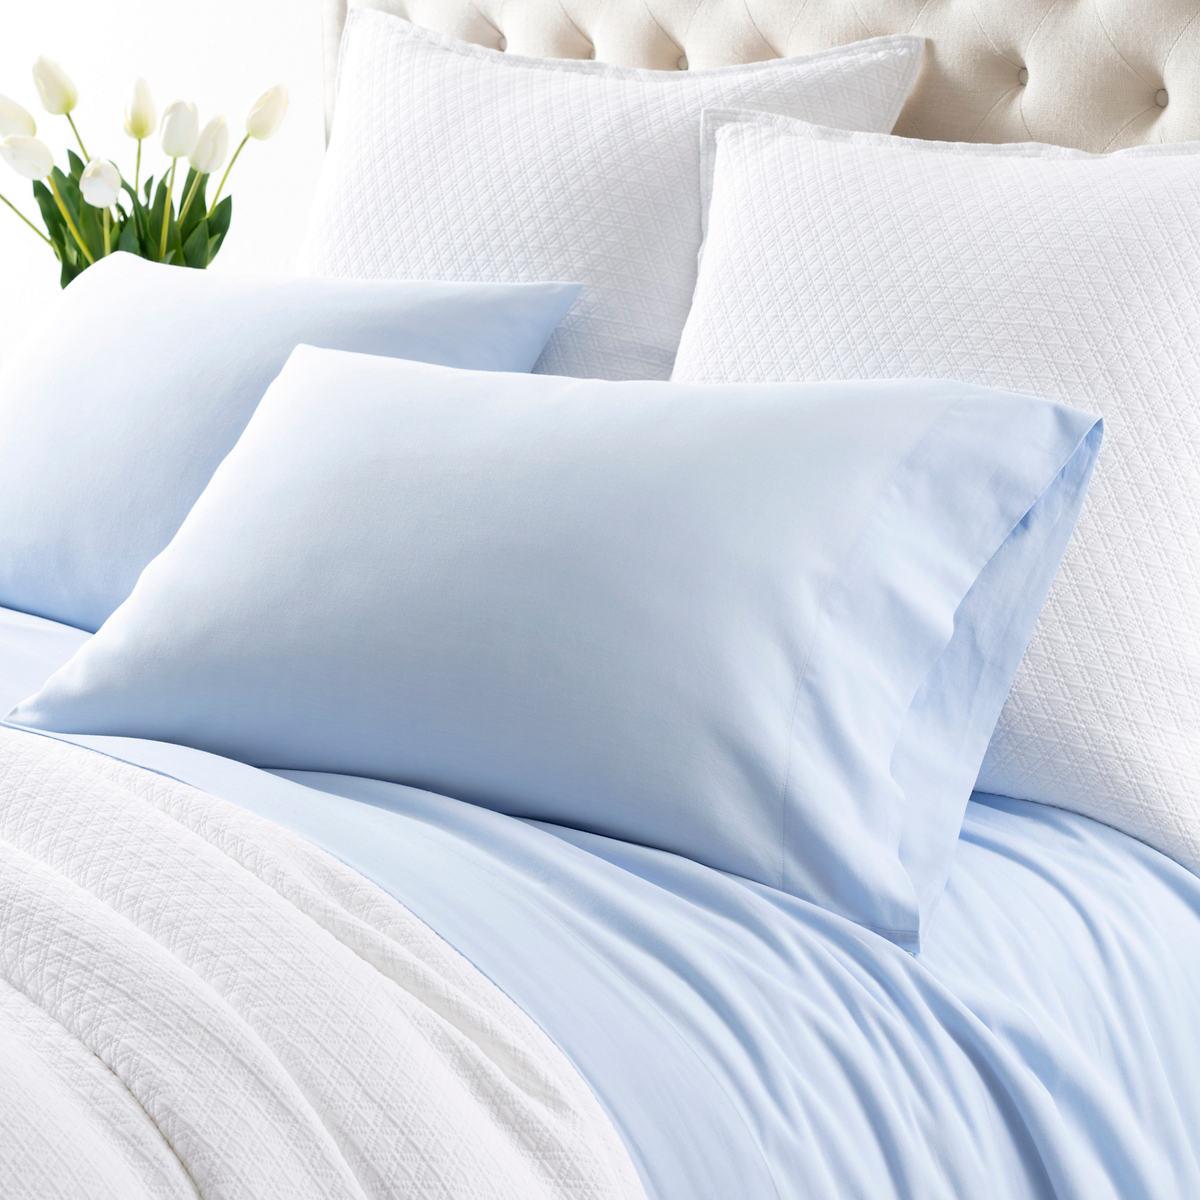 Comfy Cotton Soft Blue Sheet Set